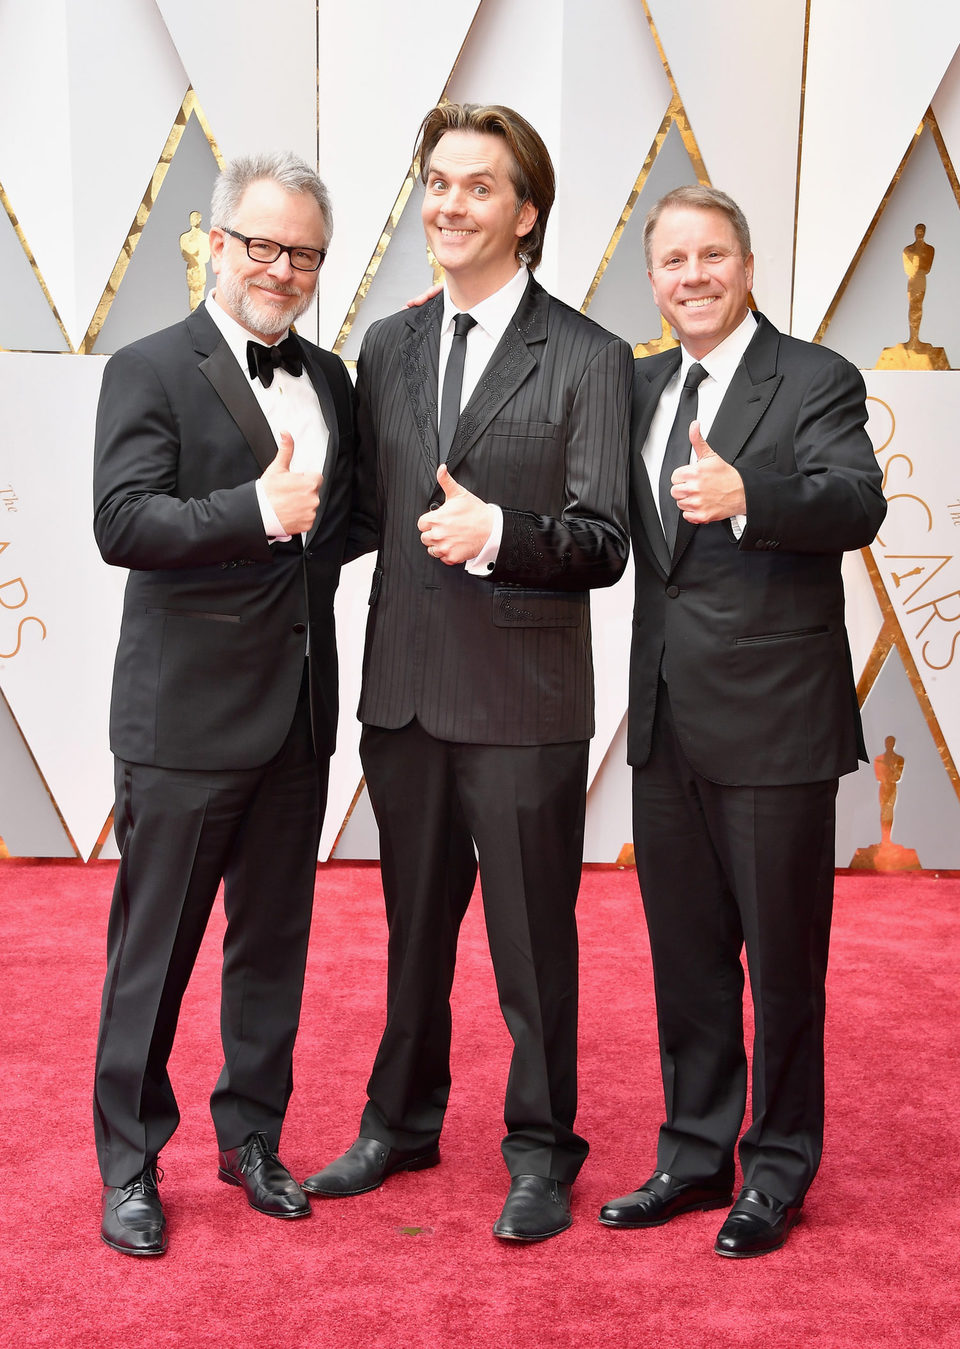 Rich Moore, Byron Howard and Jared Bush at the Oscars 2017 red carpet